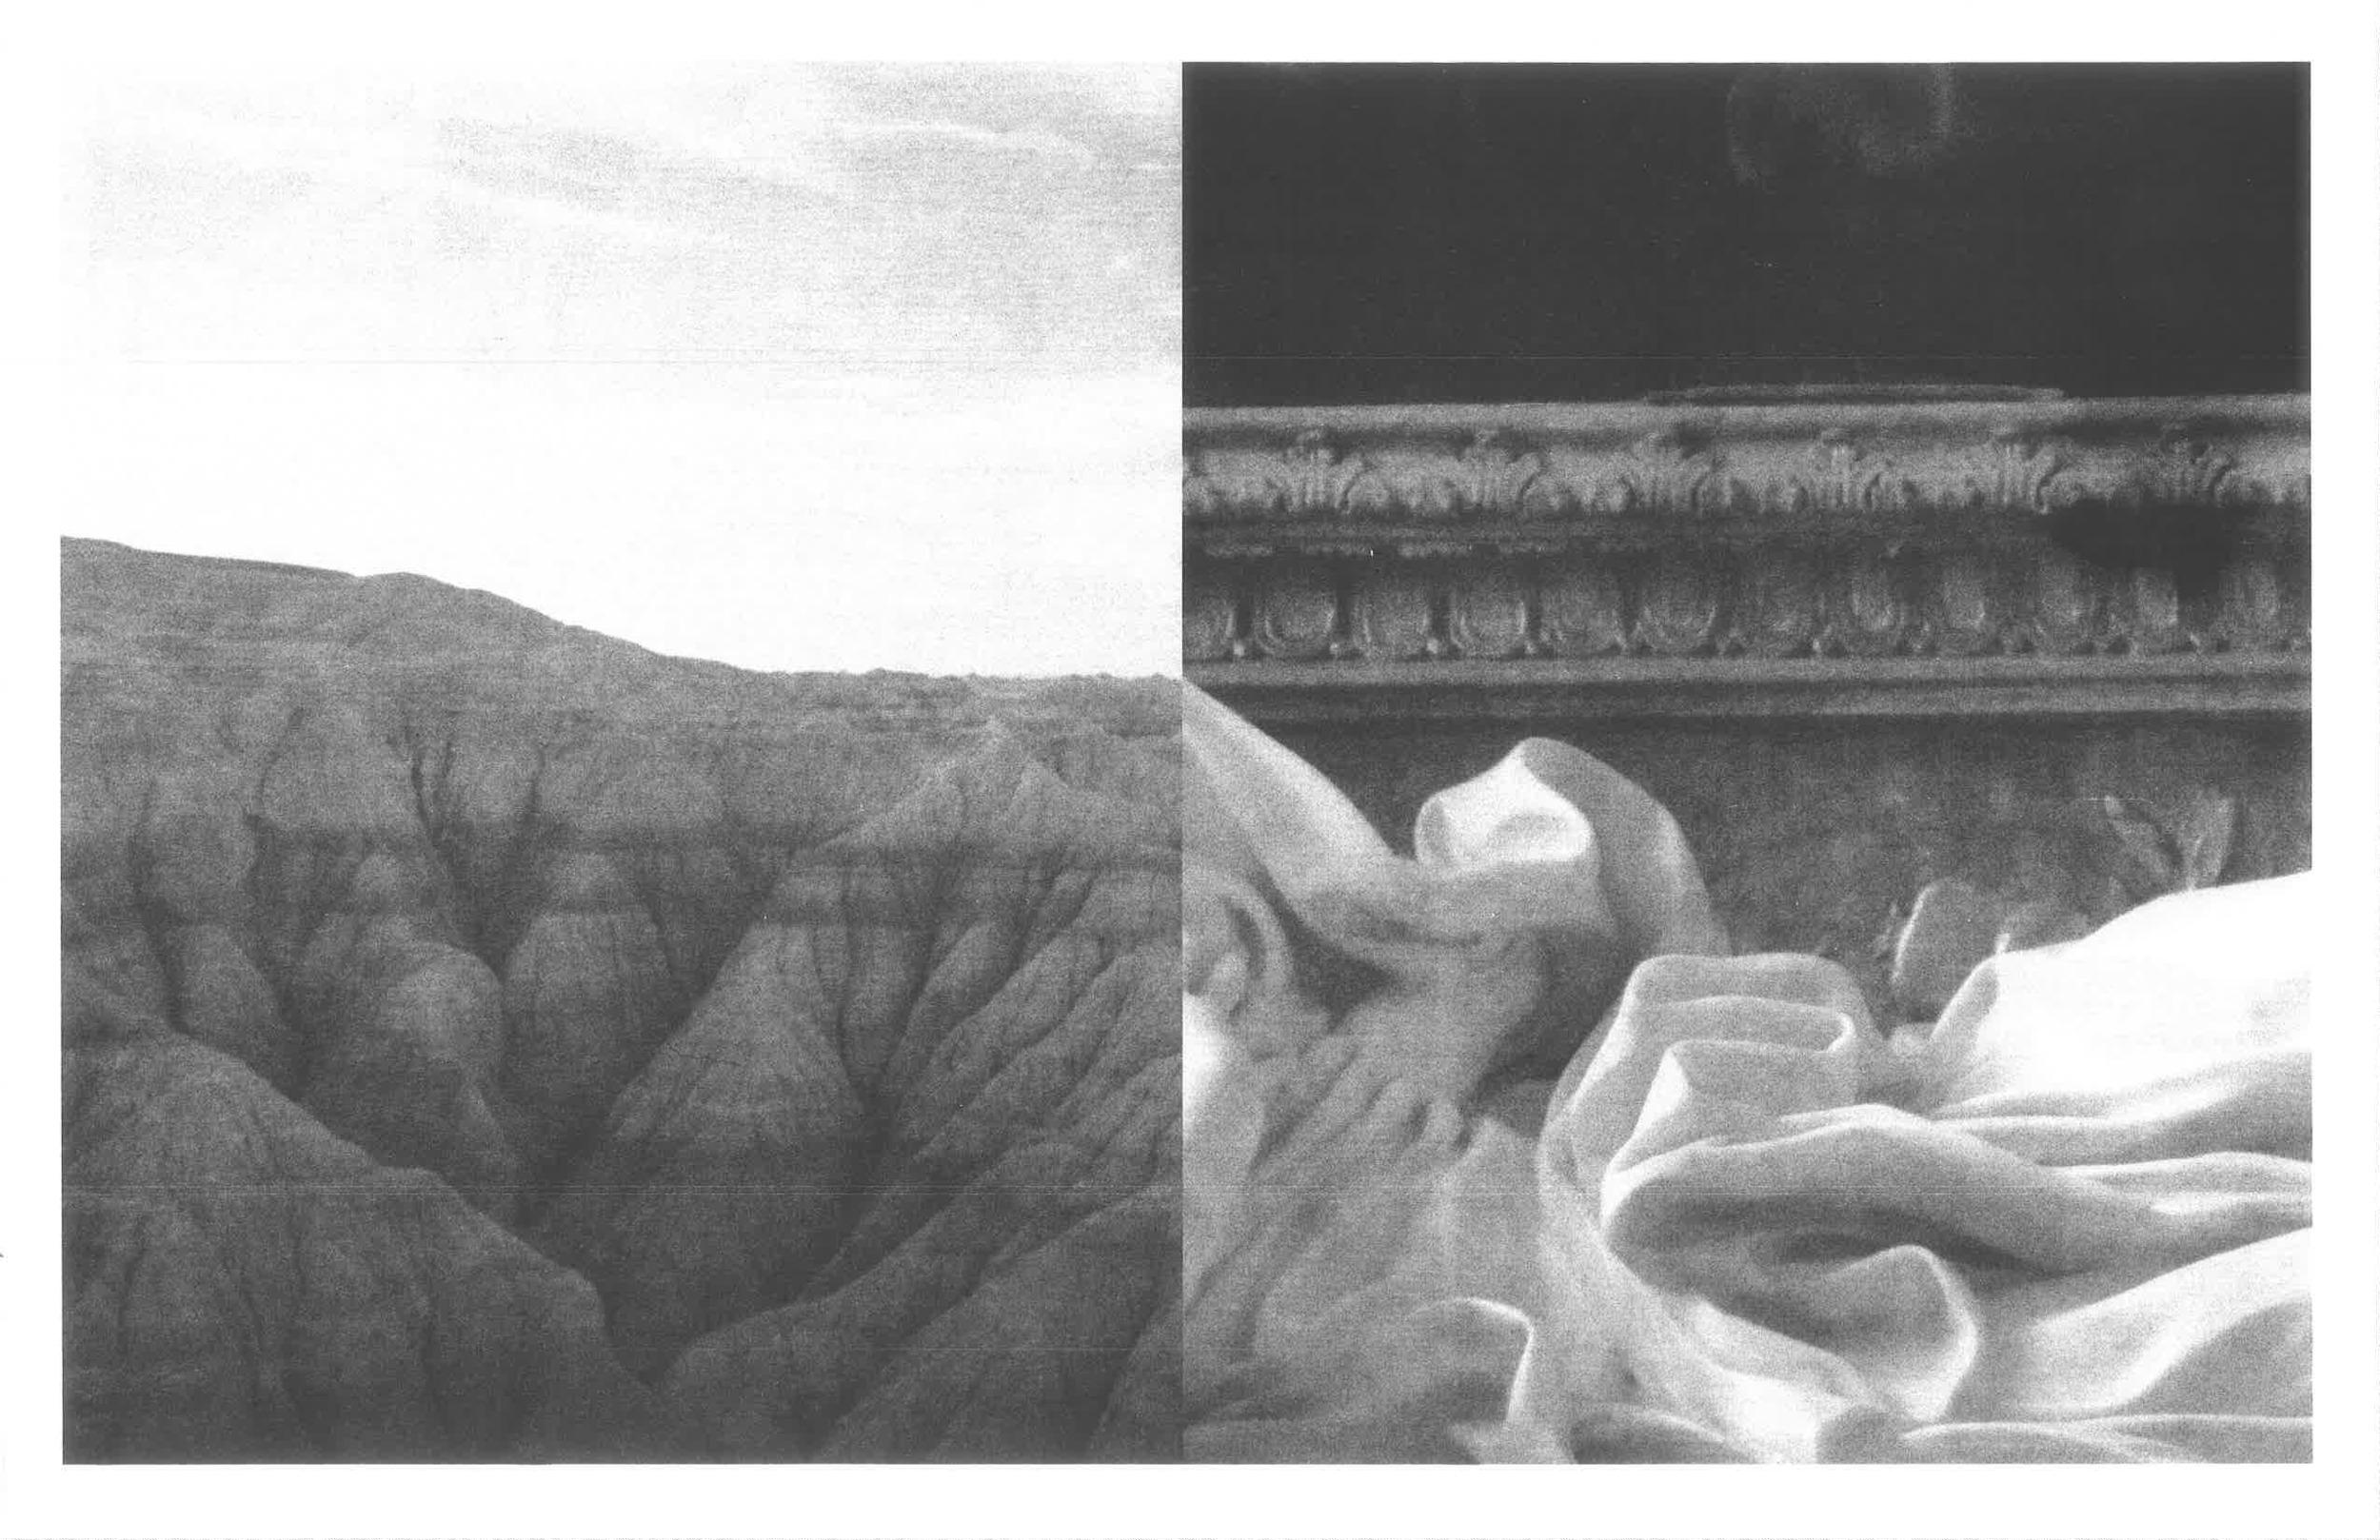 Owen Laurion - Desert(ing) Reality: A Survey of Recent Work by Jon Geiger   Boyang Hou - Lara's saints